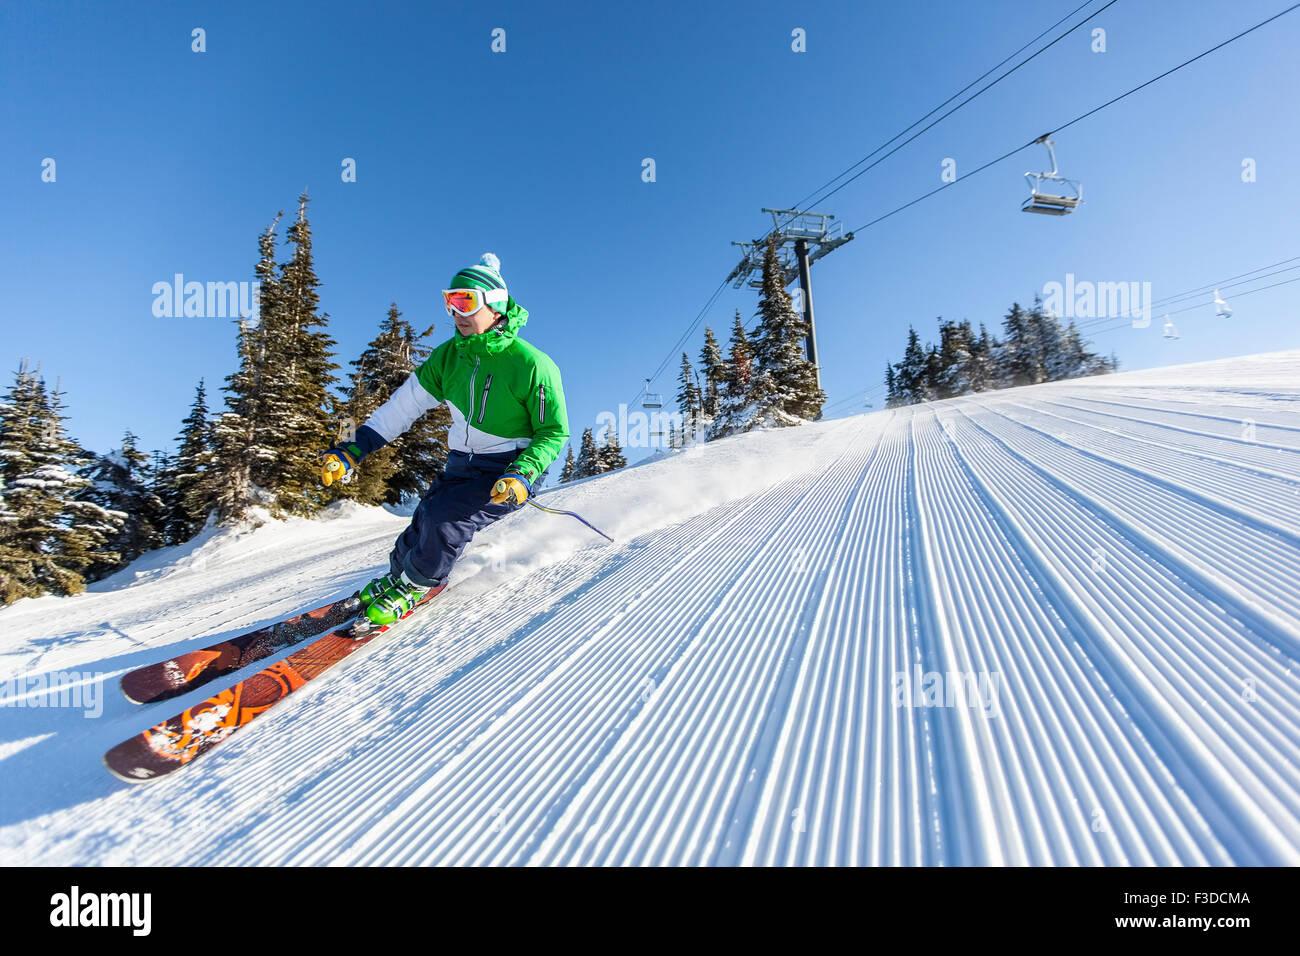 Reifer Mann auf Skipiste unter blauem Himmel Stockbild